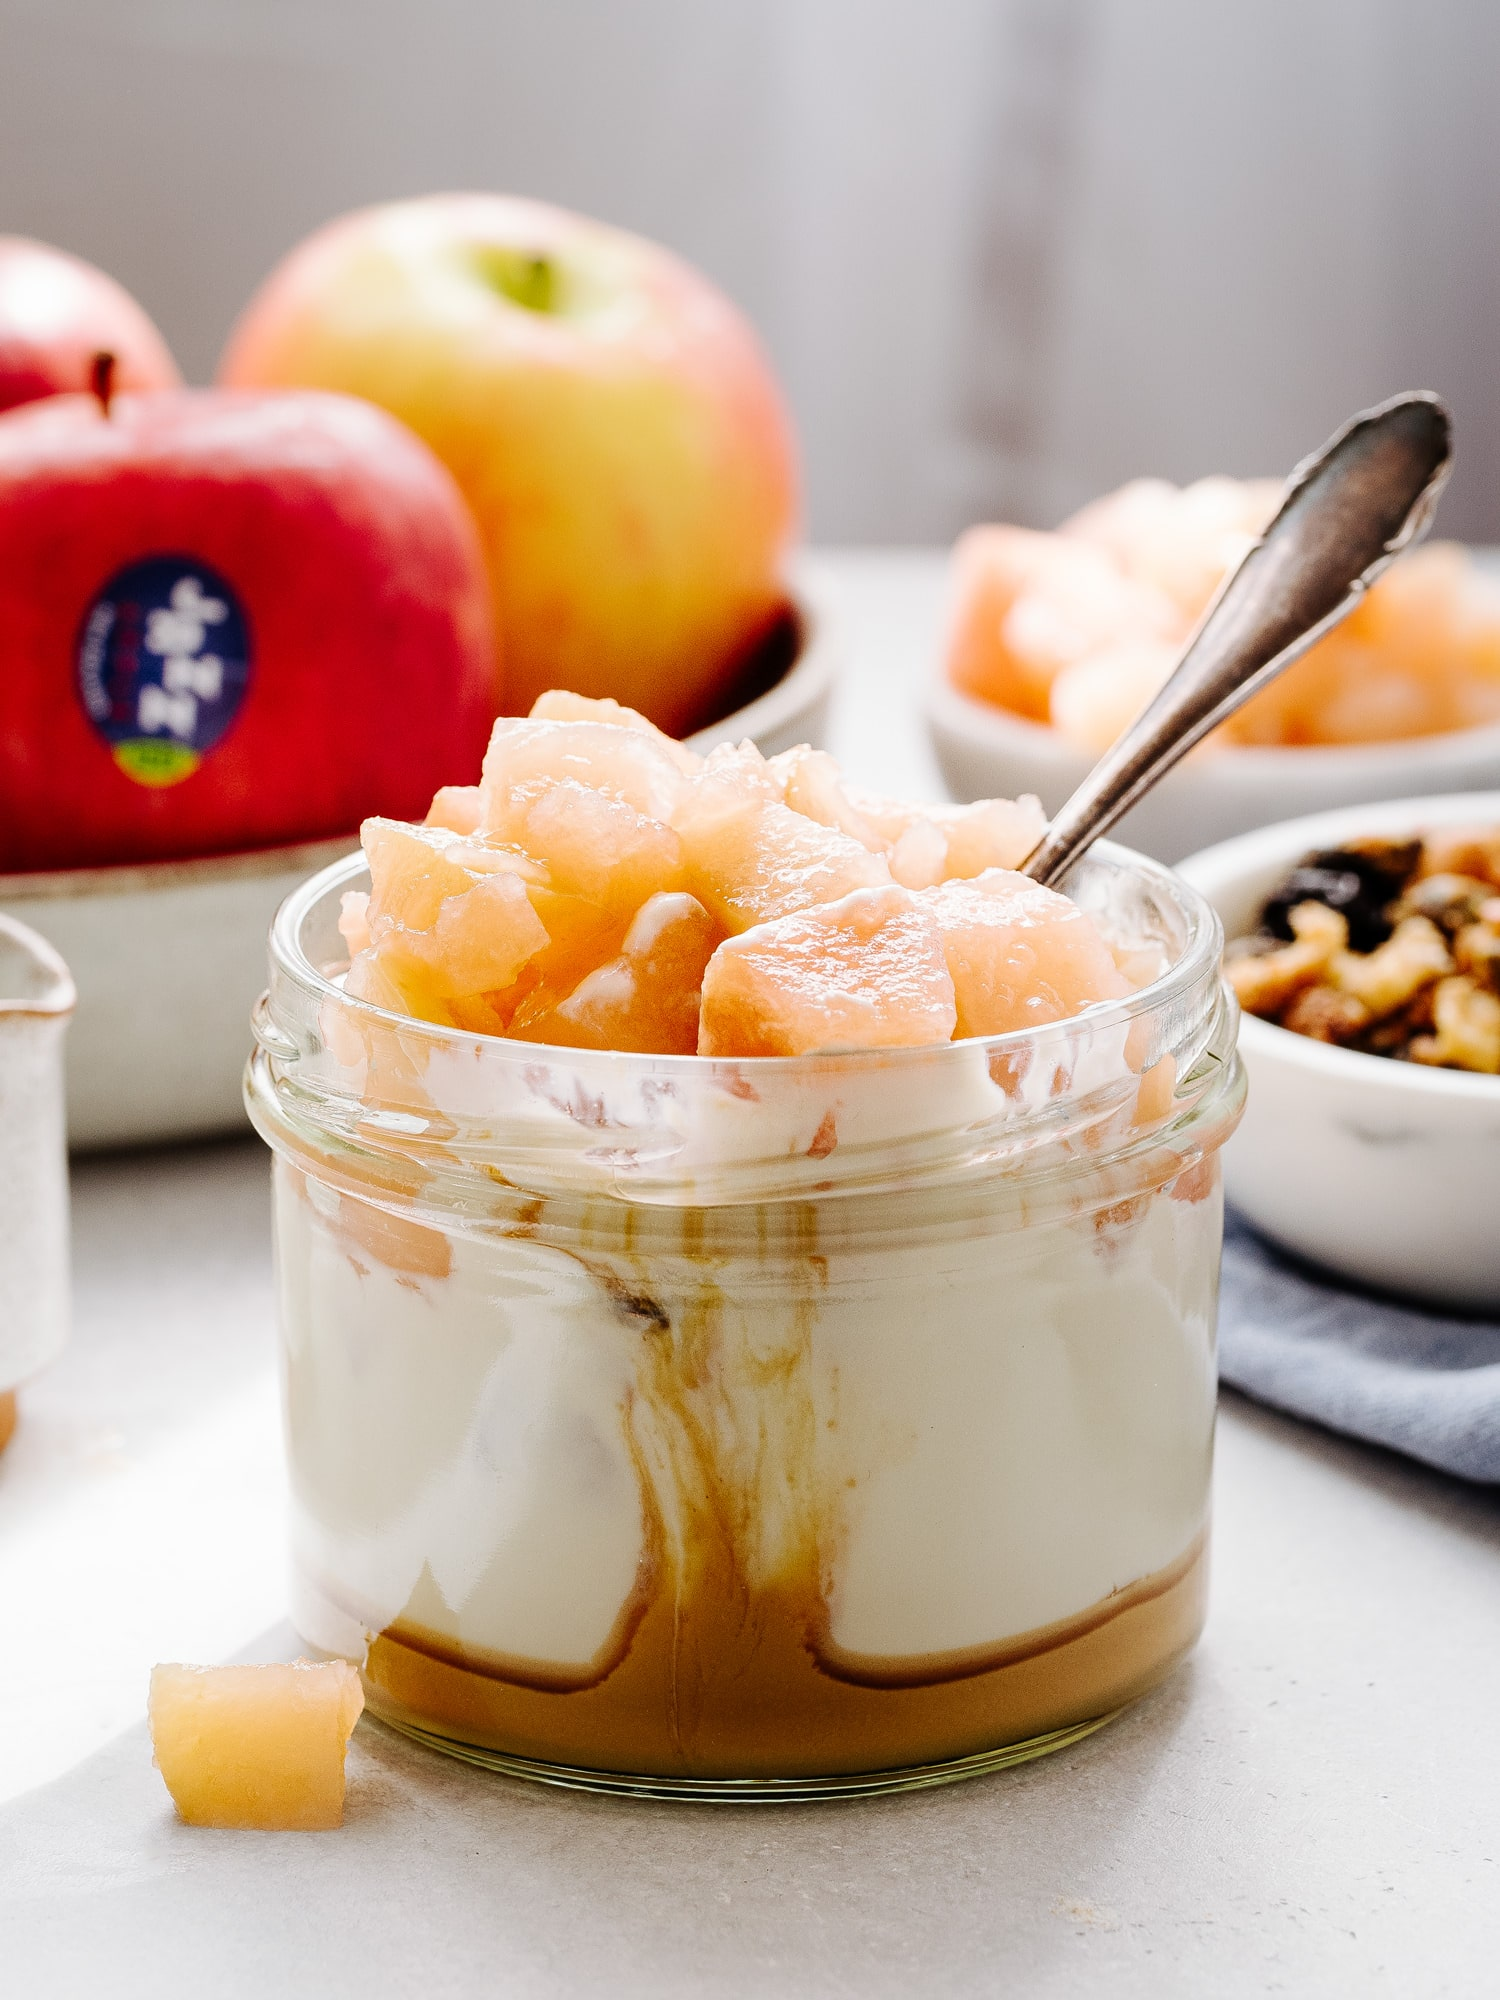 Apfelkompott, Joghurt und Erdnussbutter